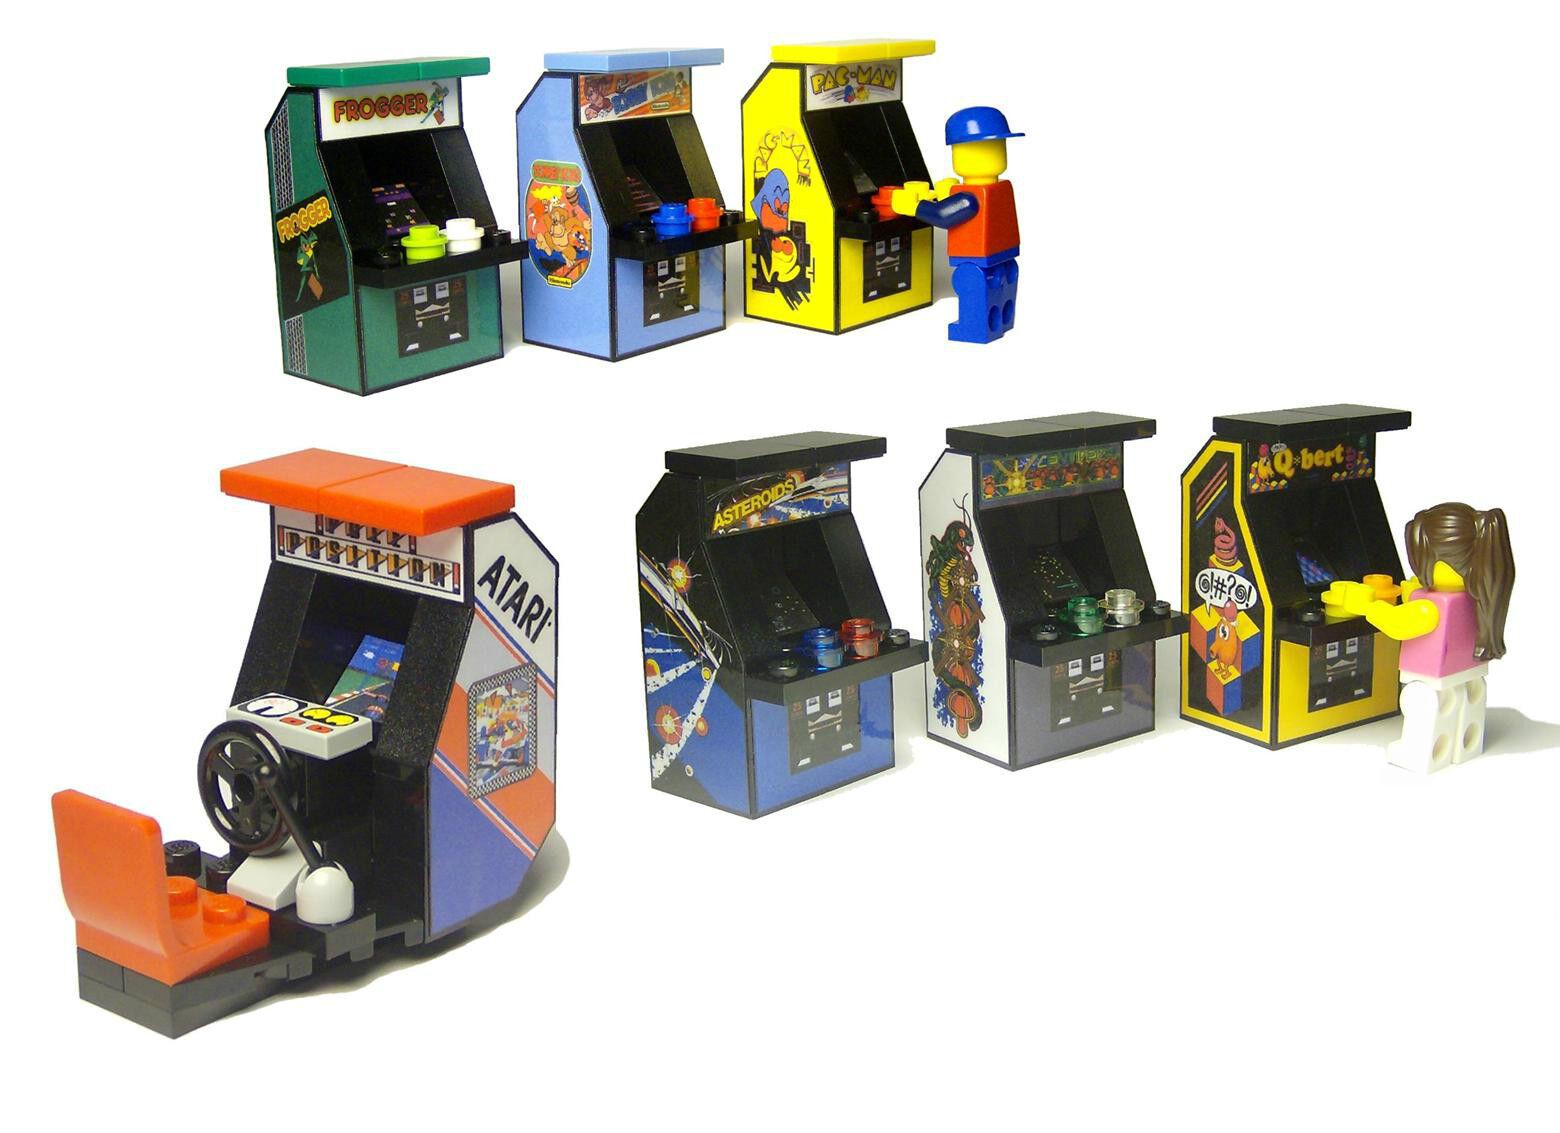 lego arcade machine